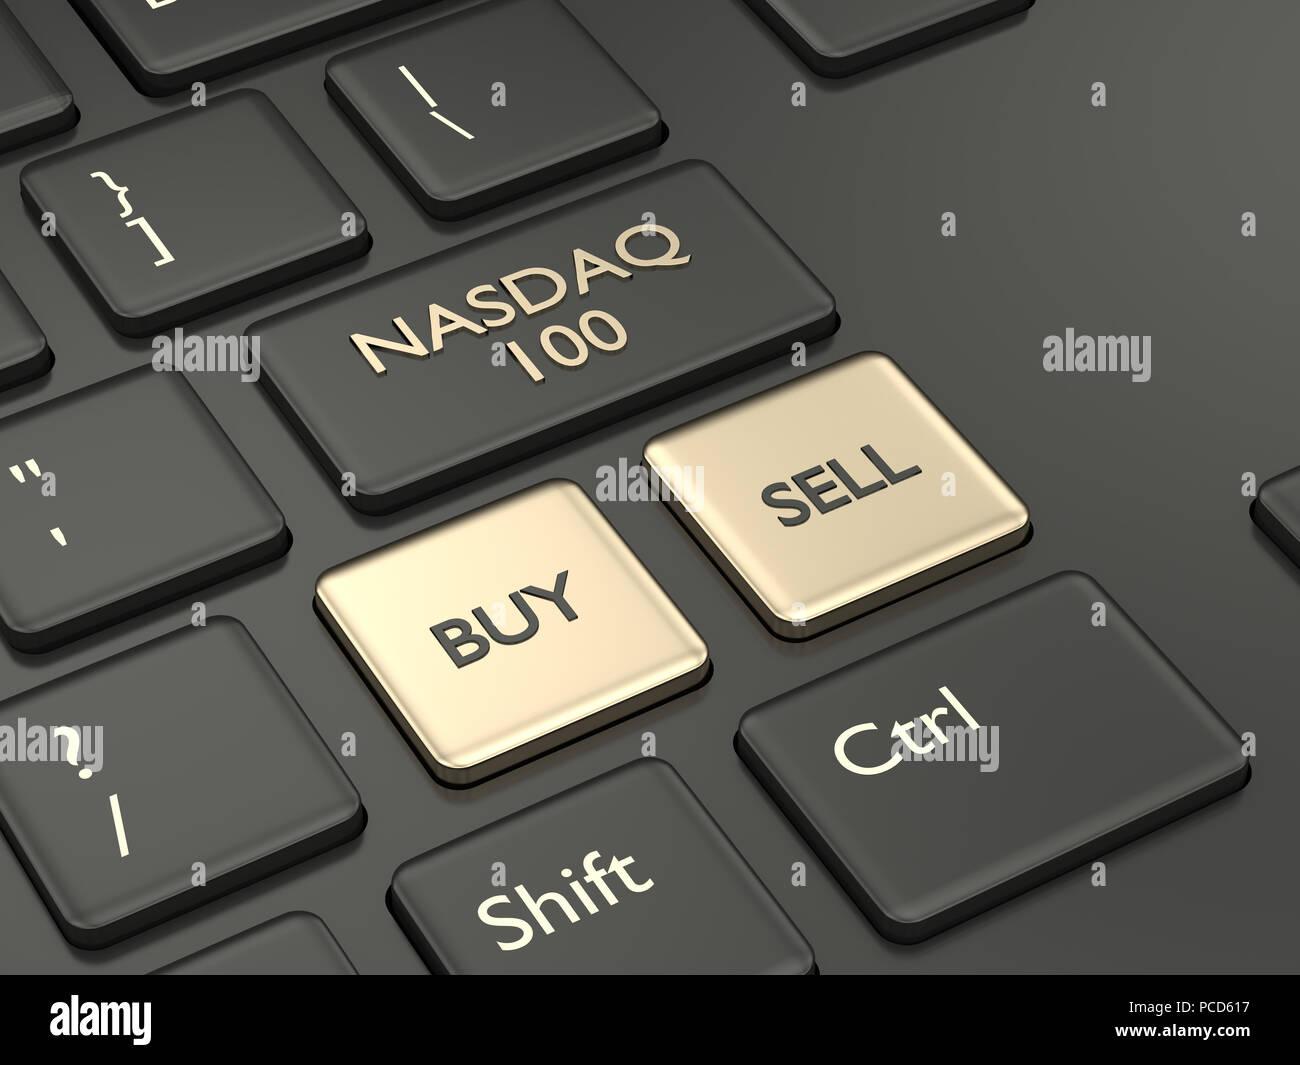 3d render closeup of computer keyboard with NASDAQ 100 index button. Stock market indexes concept. - Stock Image